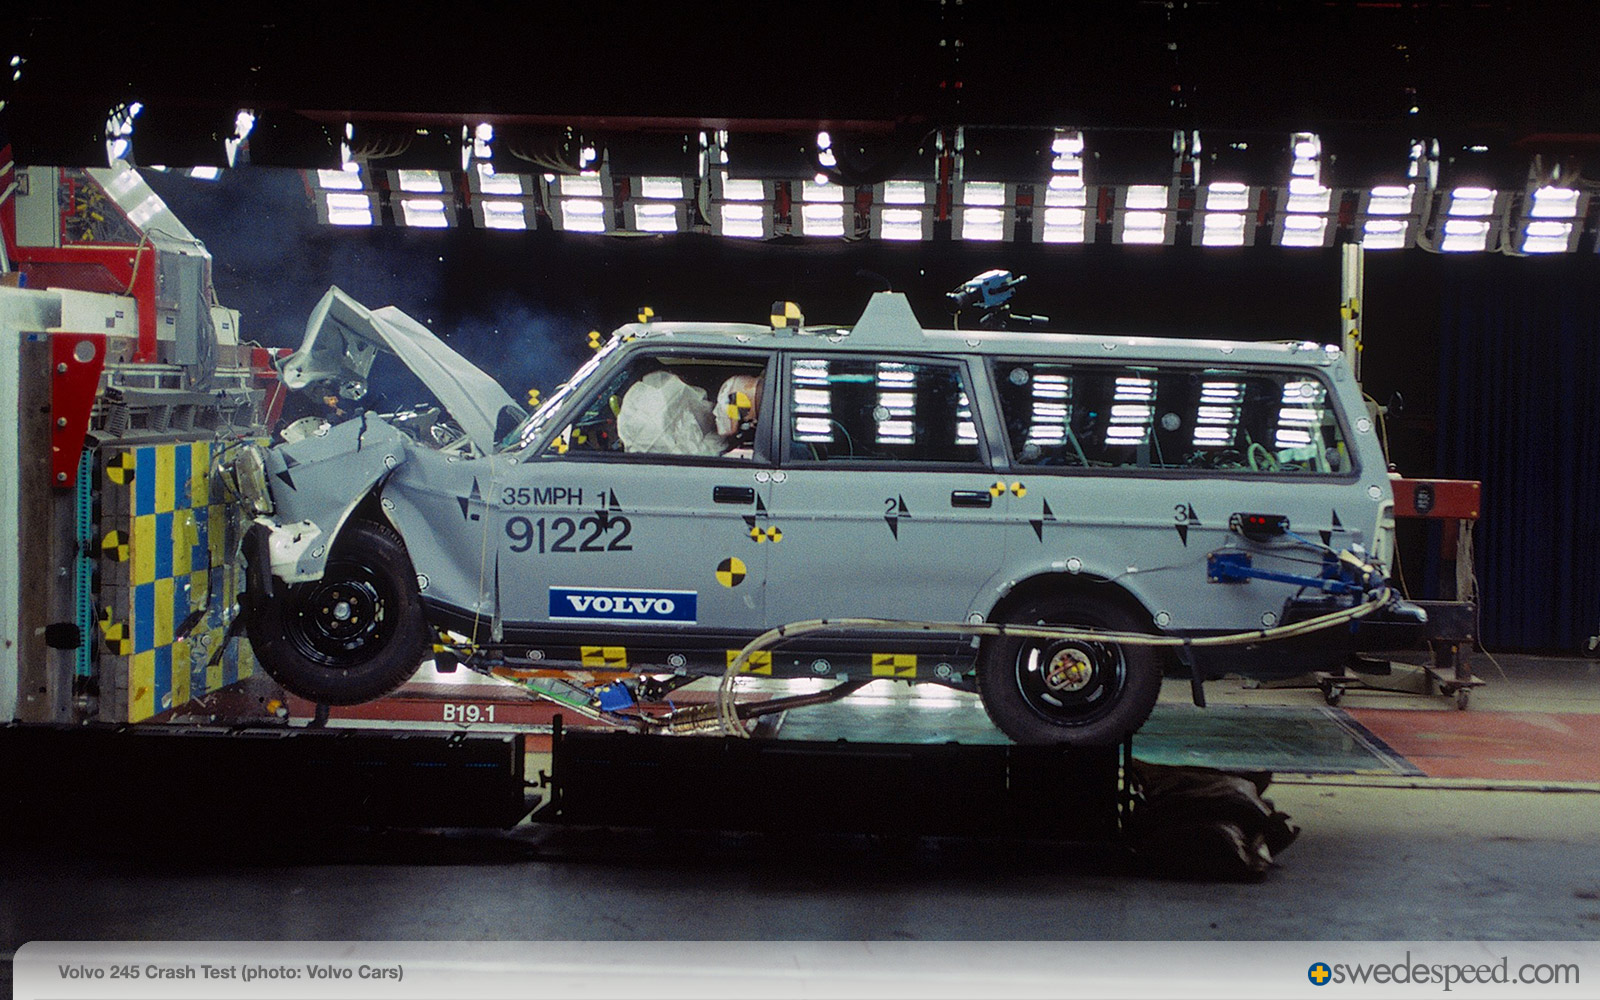 Volvo 245 Crash Test